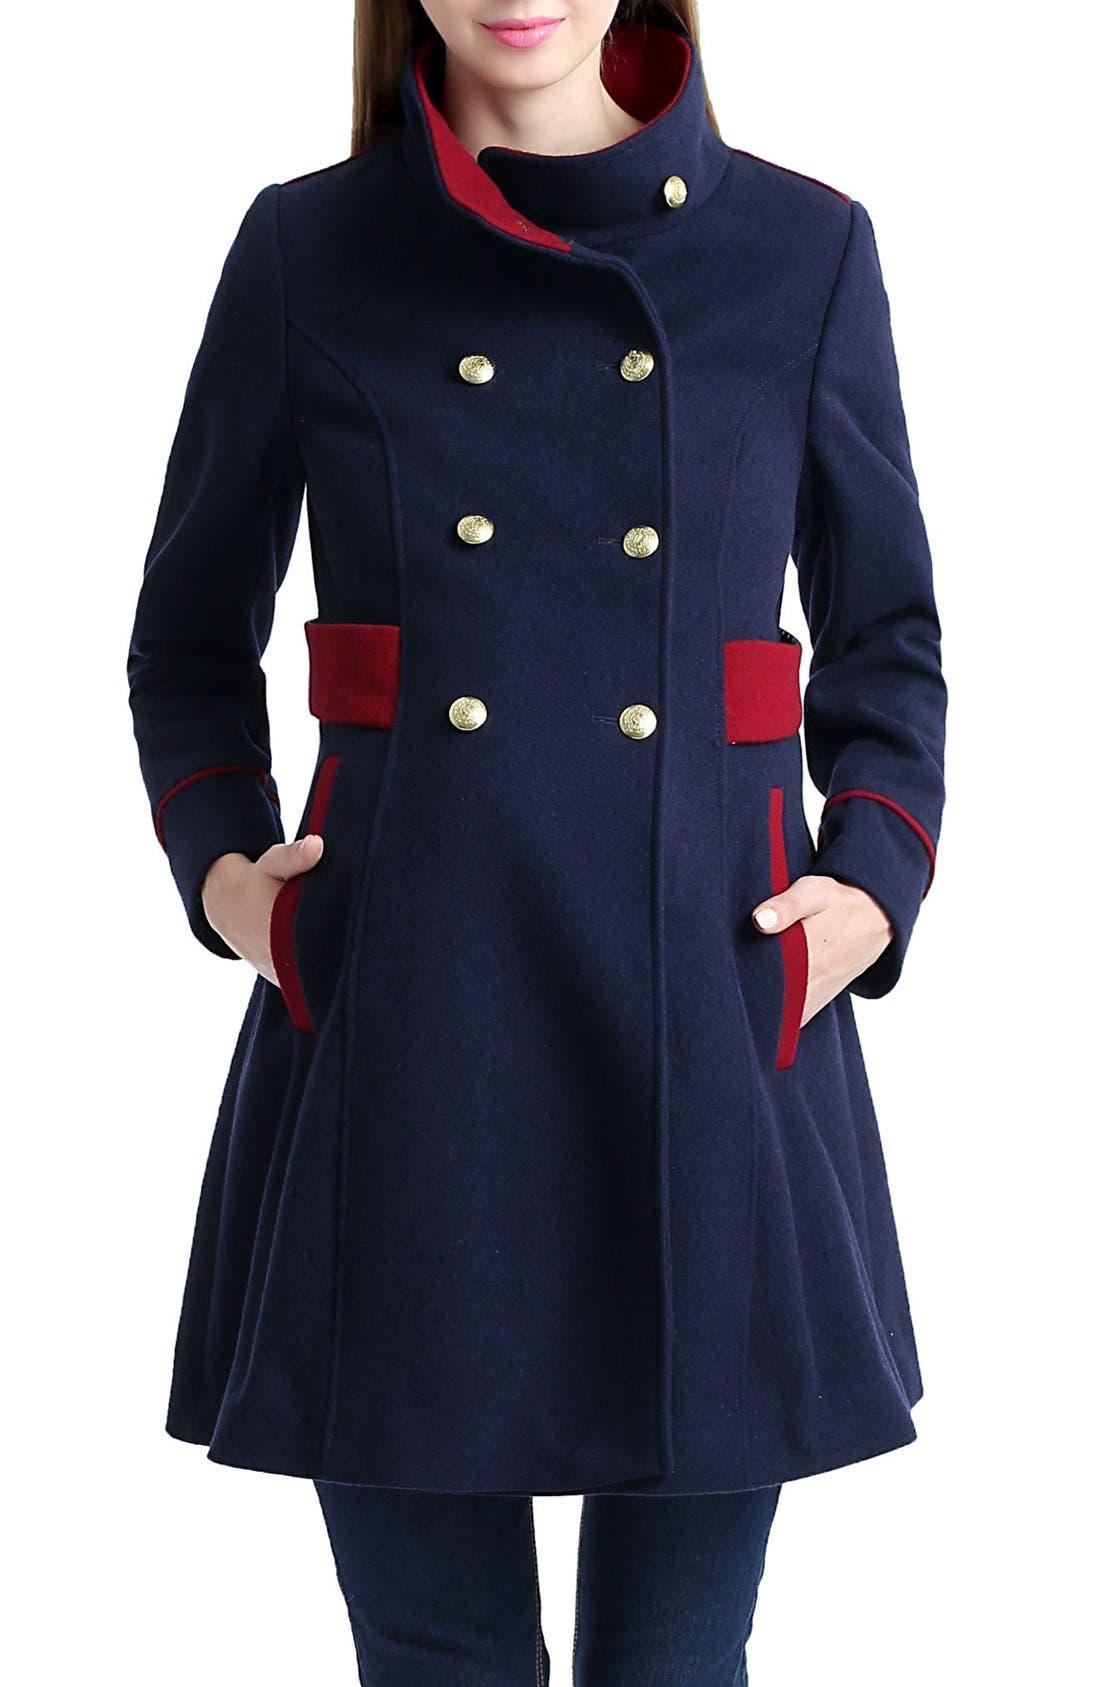 KIMI AND KAI, Nom 'Pan' Military Maternity Pea Coat, Main thumbnail 1, color, NAVY